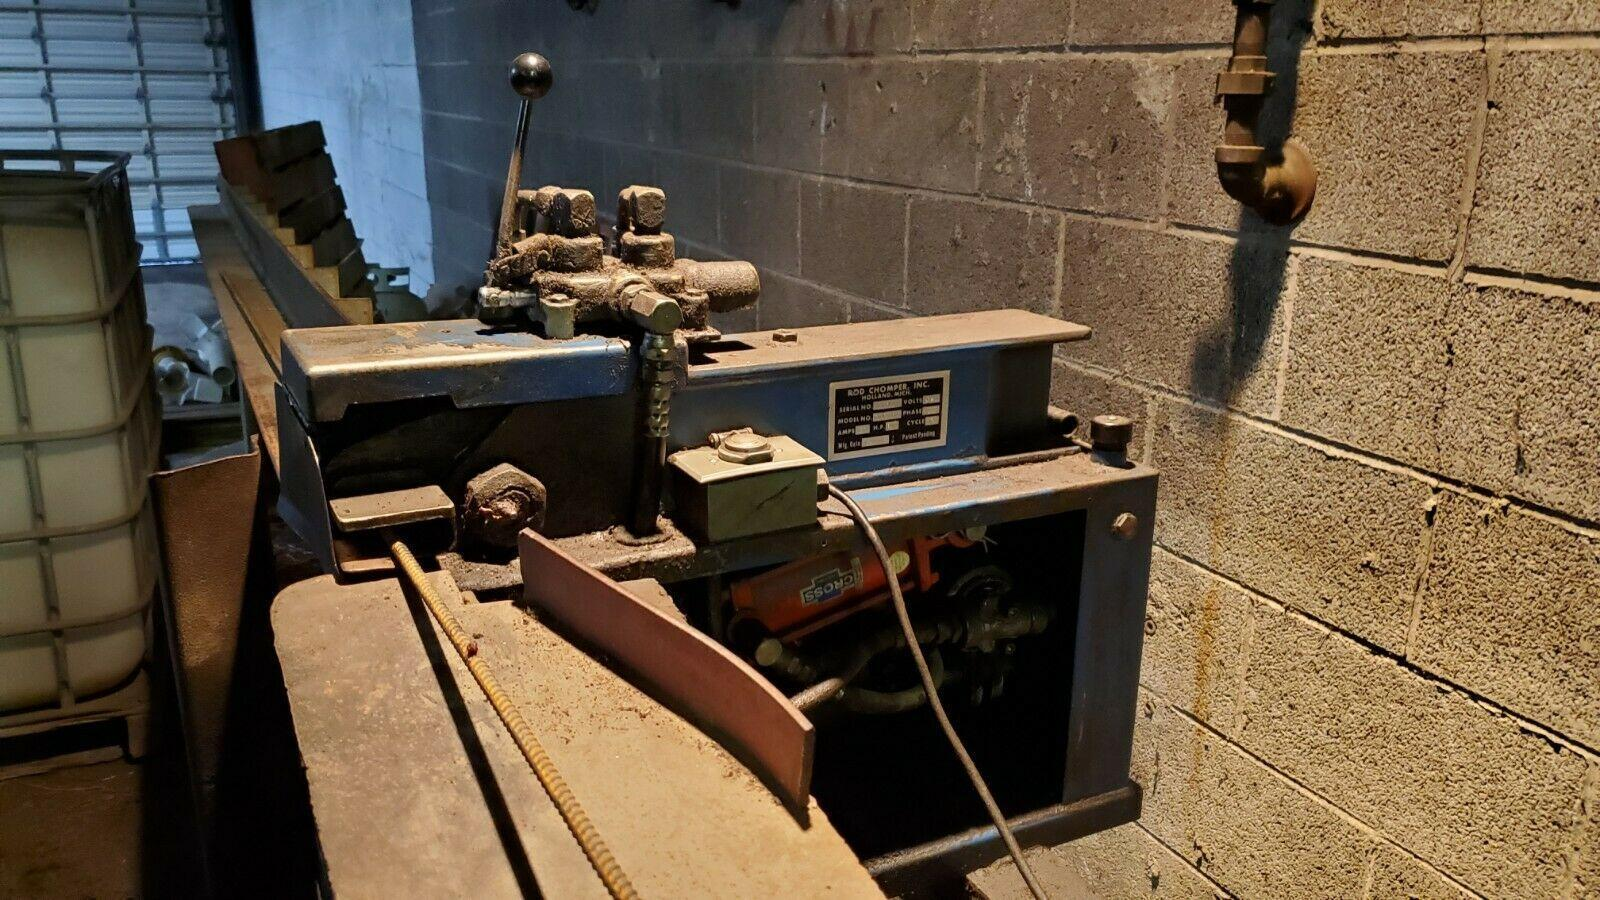 6 BAR ROD CHOMPER MODEL RCE-6 REBAR CUTTING MACHINE: STOCK #12710